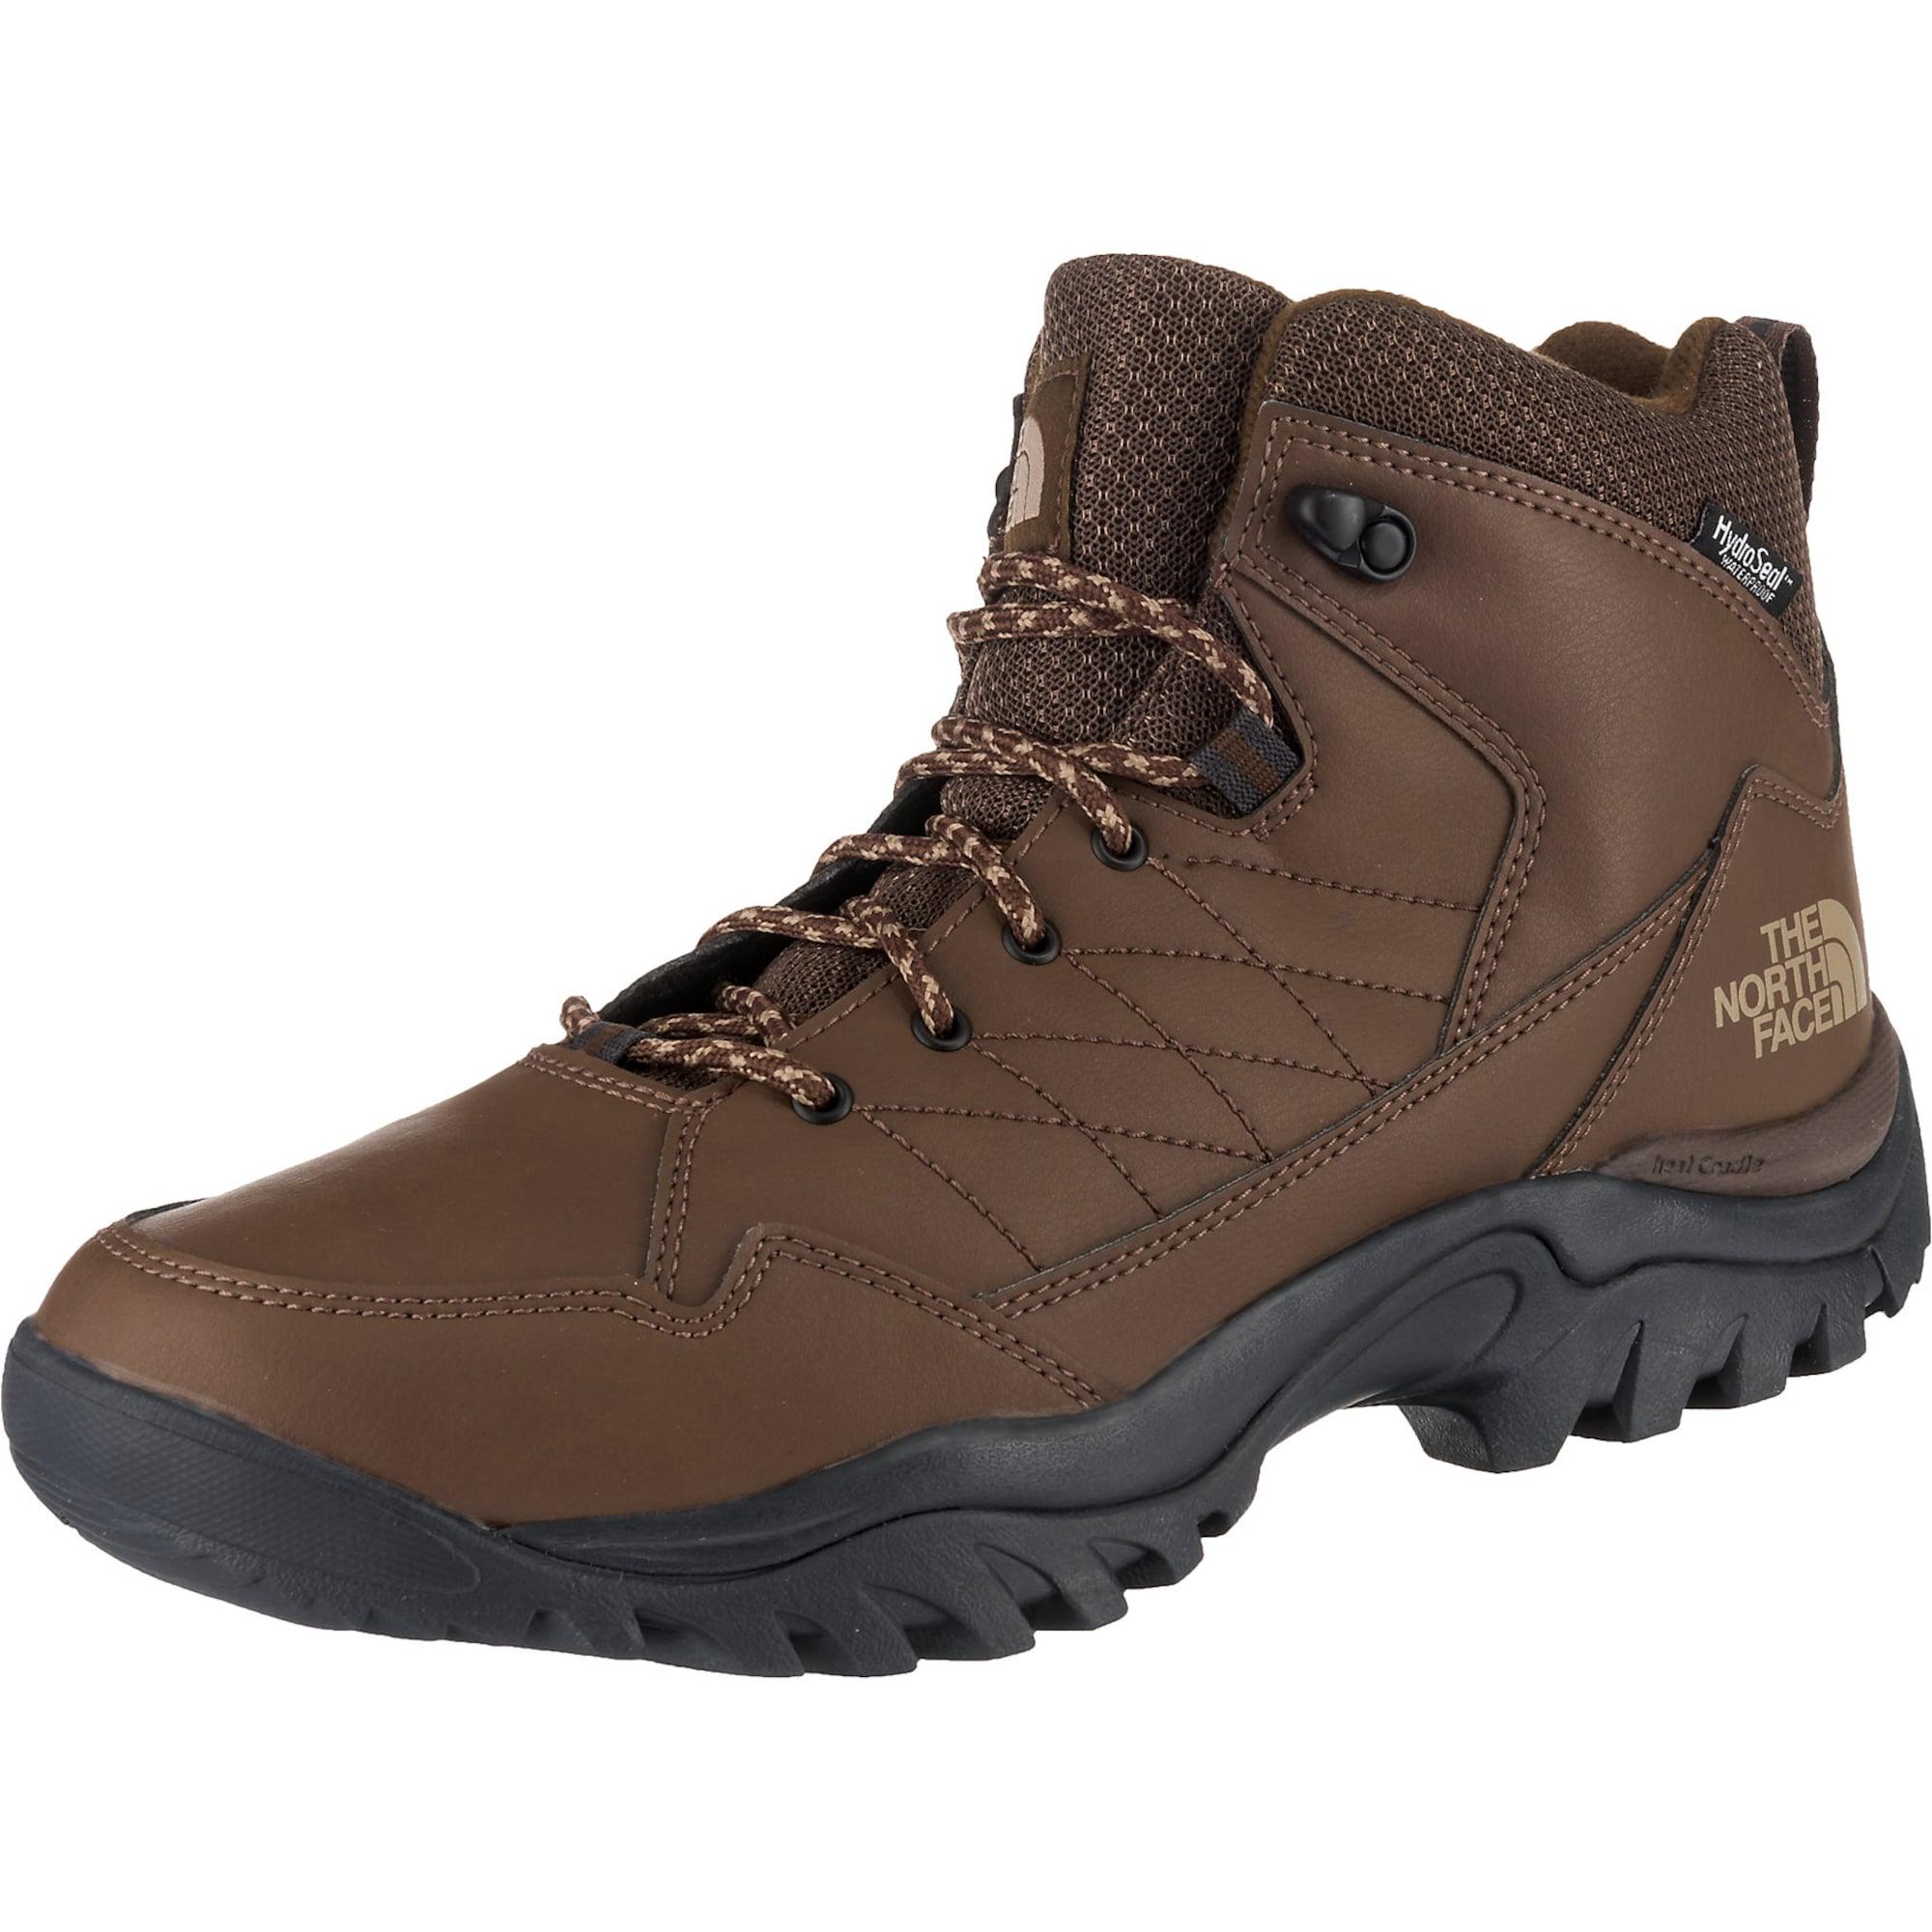 Wanderstiefel   Schuhe > Outdoorschuhe > Wanderstiefel   The North Face